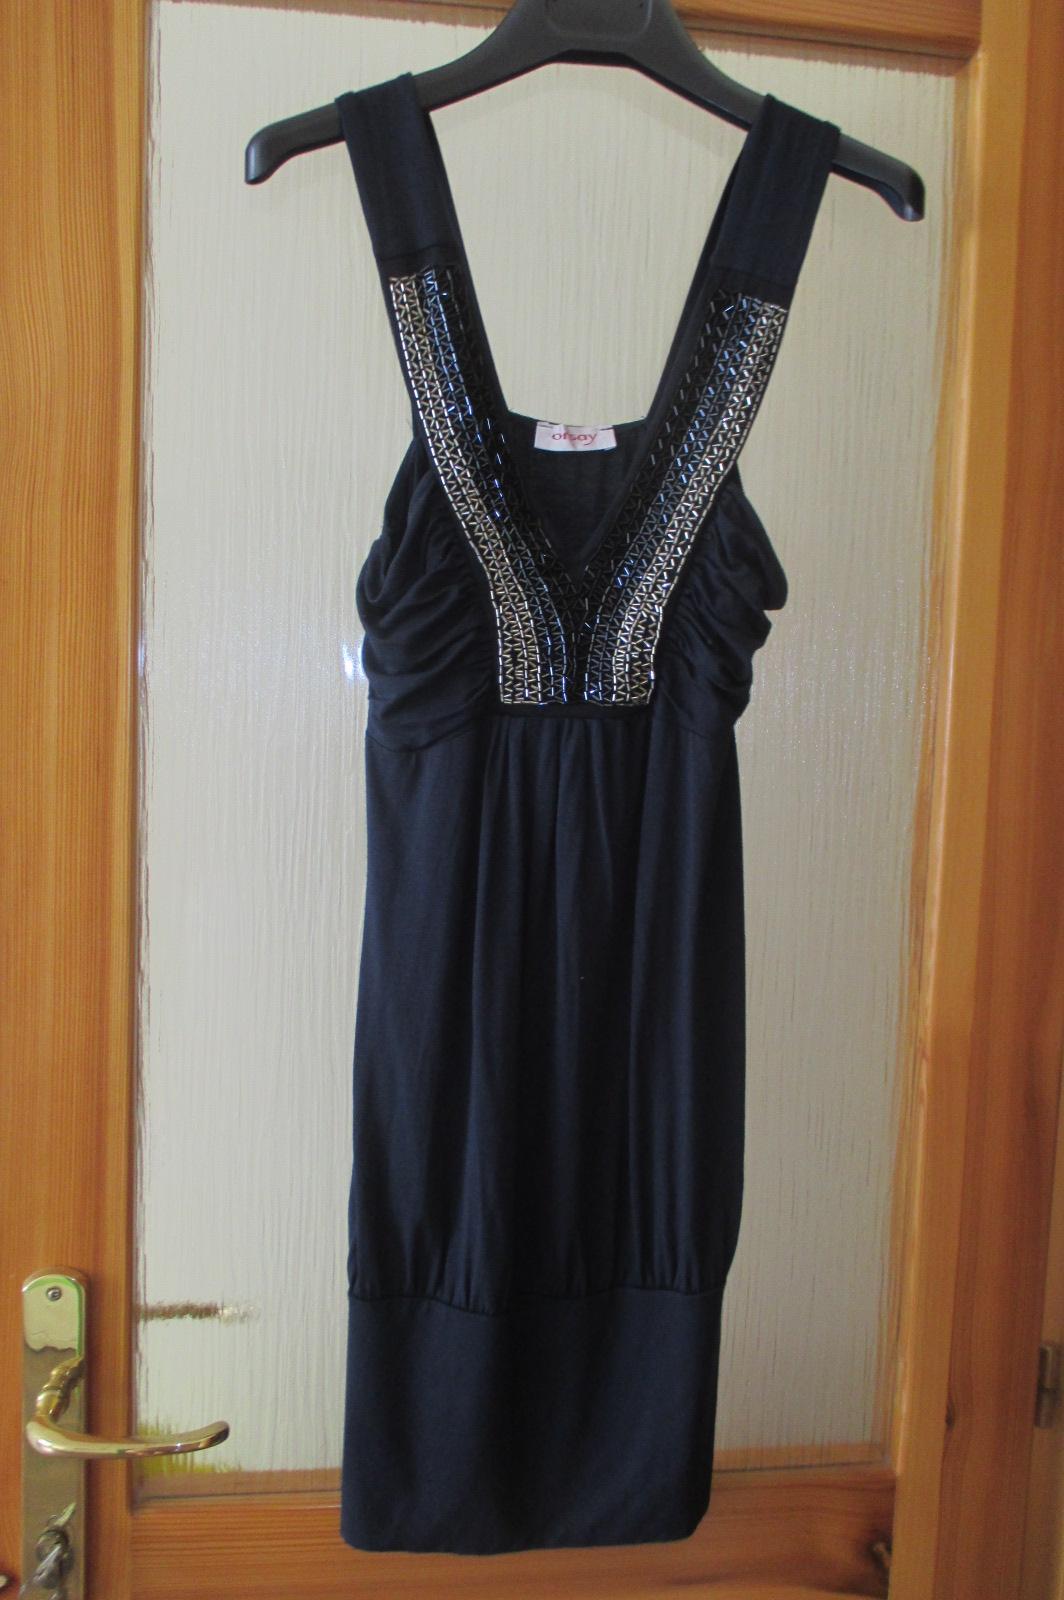 šaty orsay - Obrázok č. 1